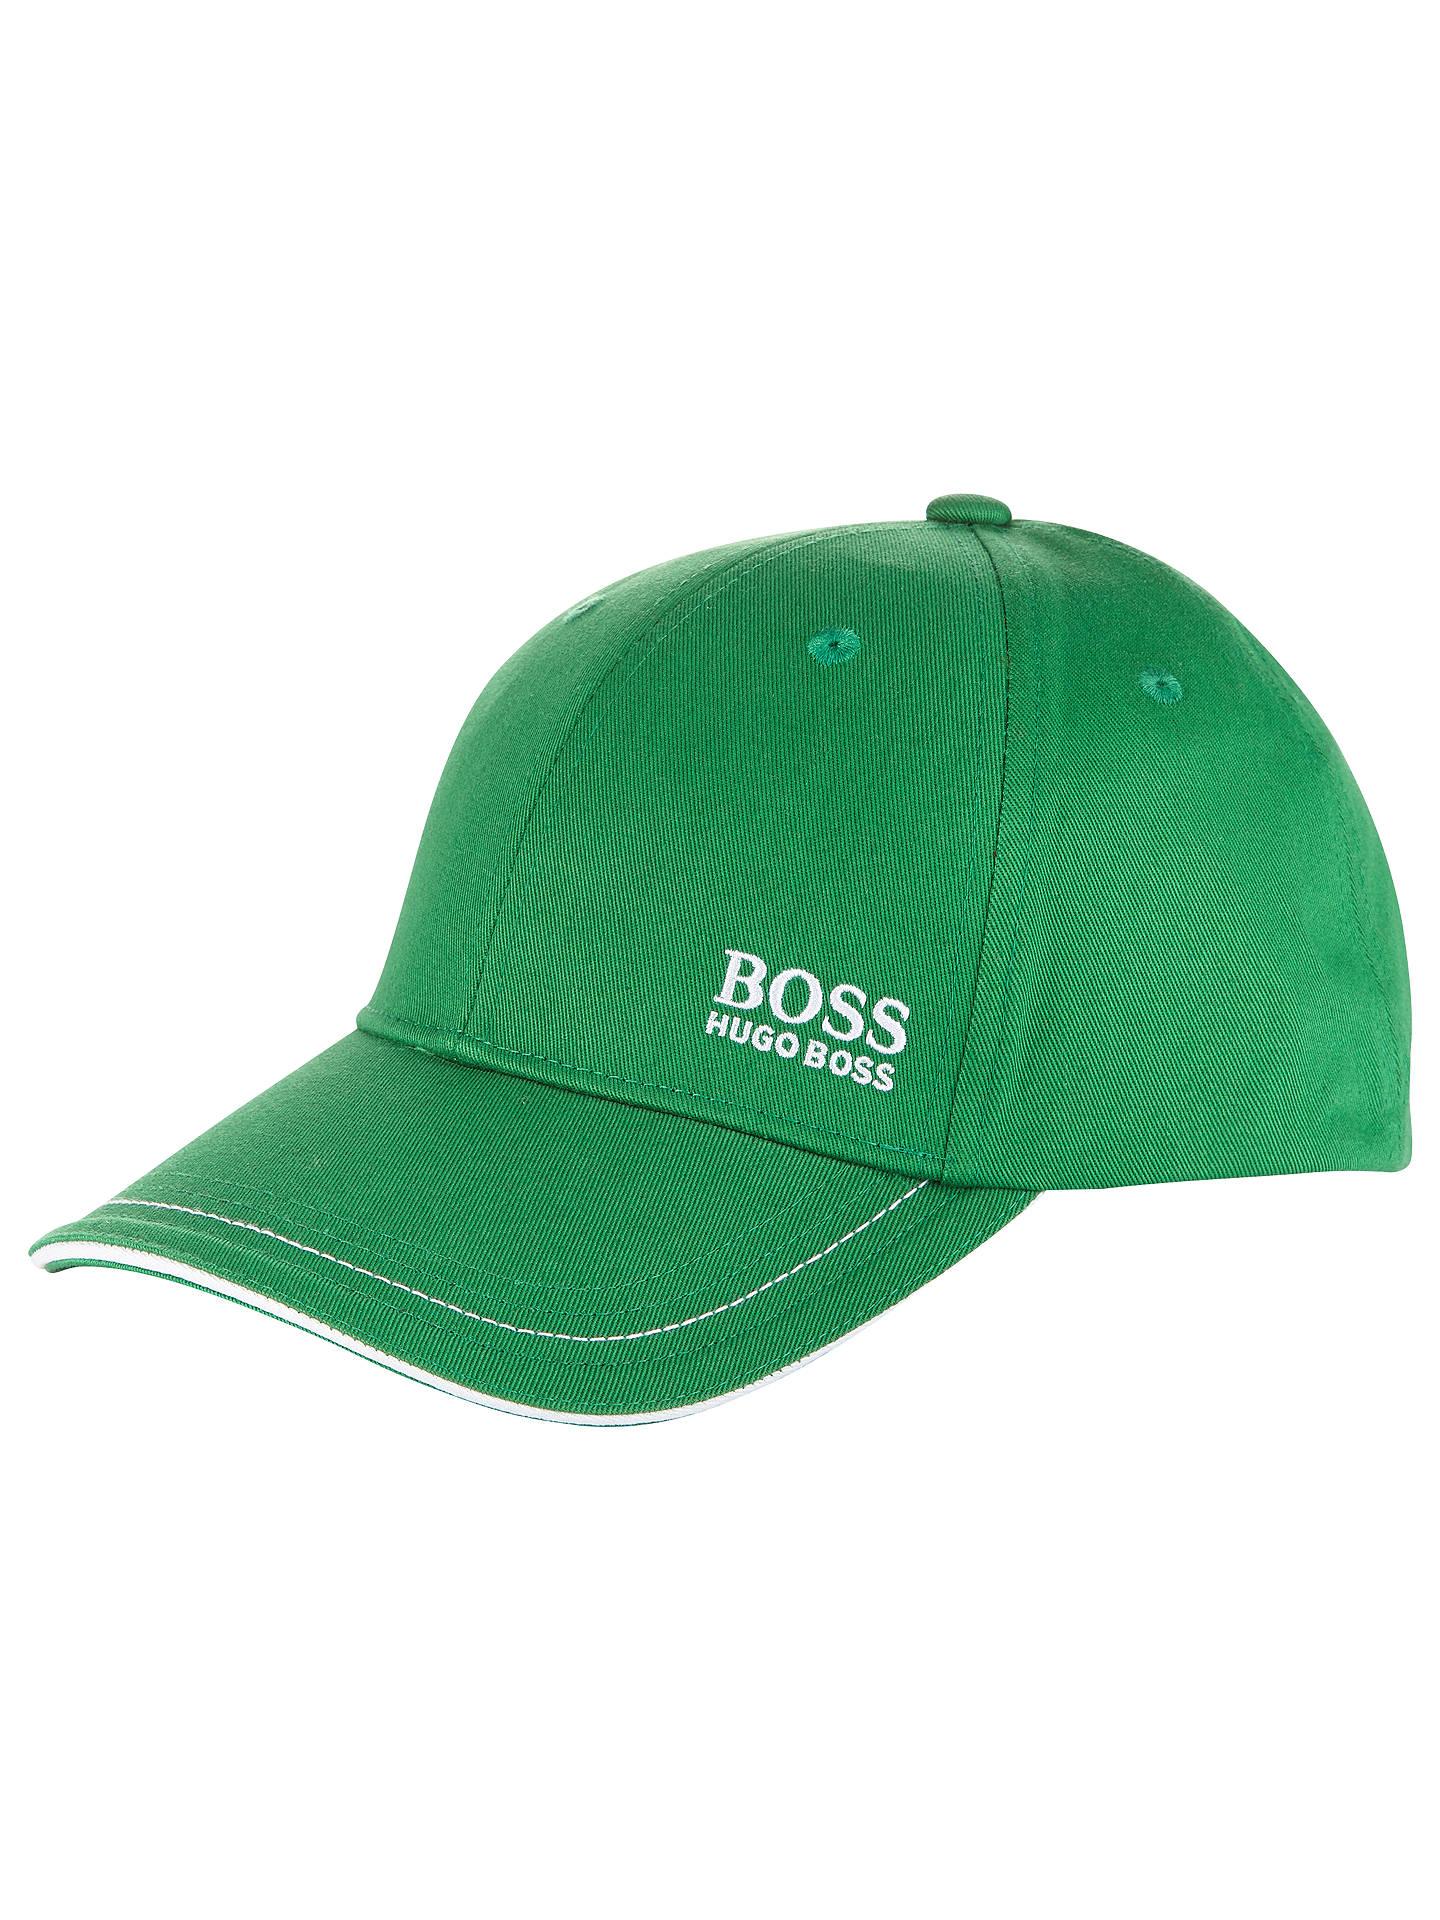 BuyBOSS Green Pro Golf Branded Baseball Cap 8d49b77df29